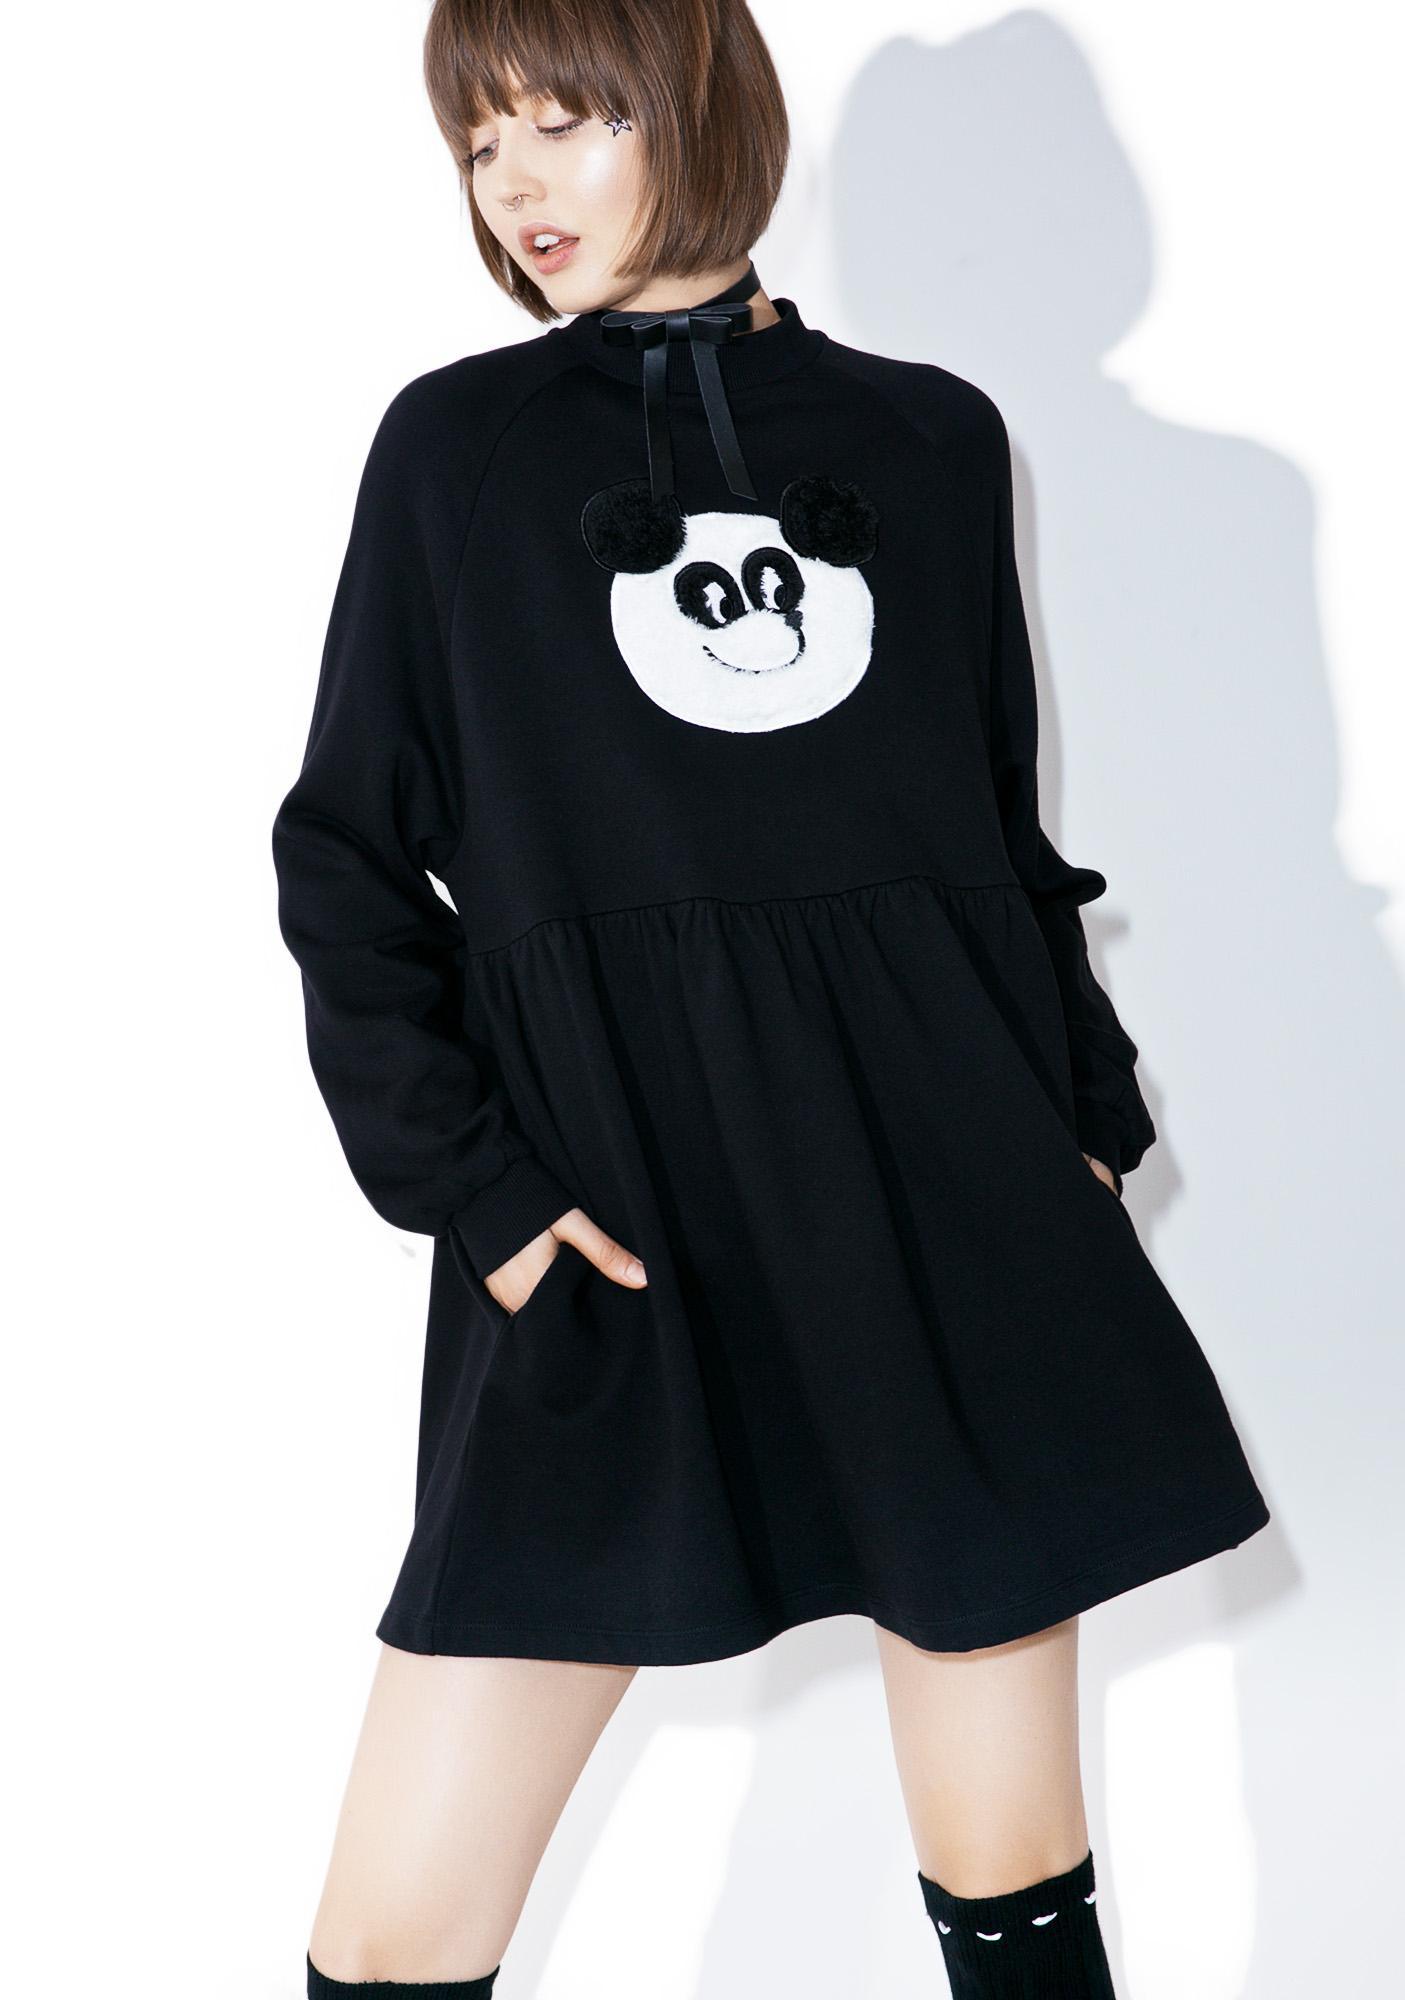 Lazy Oaf Panda Sweater Dress